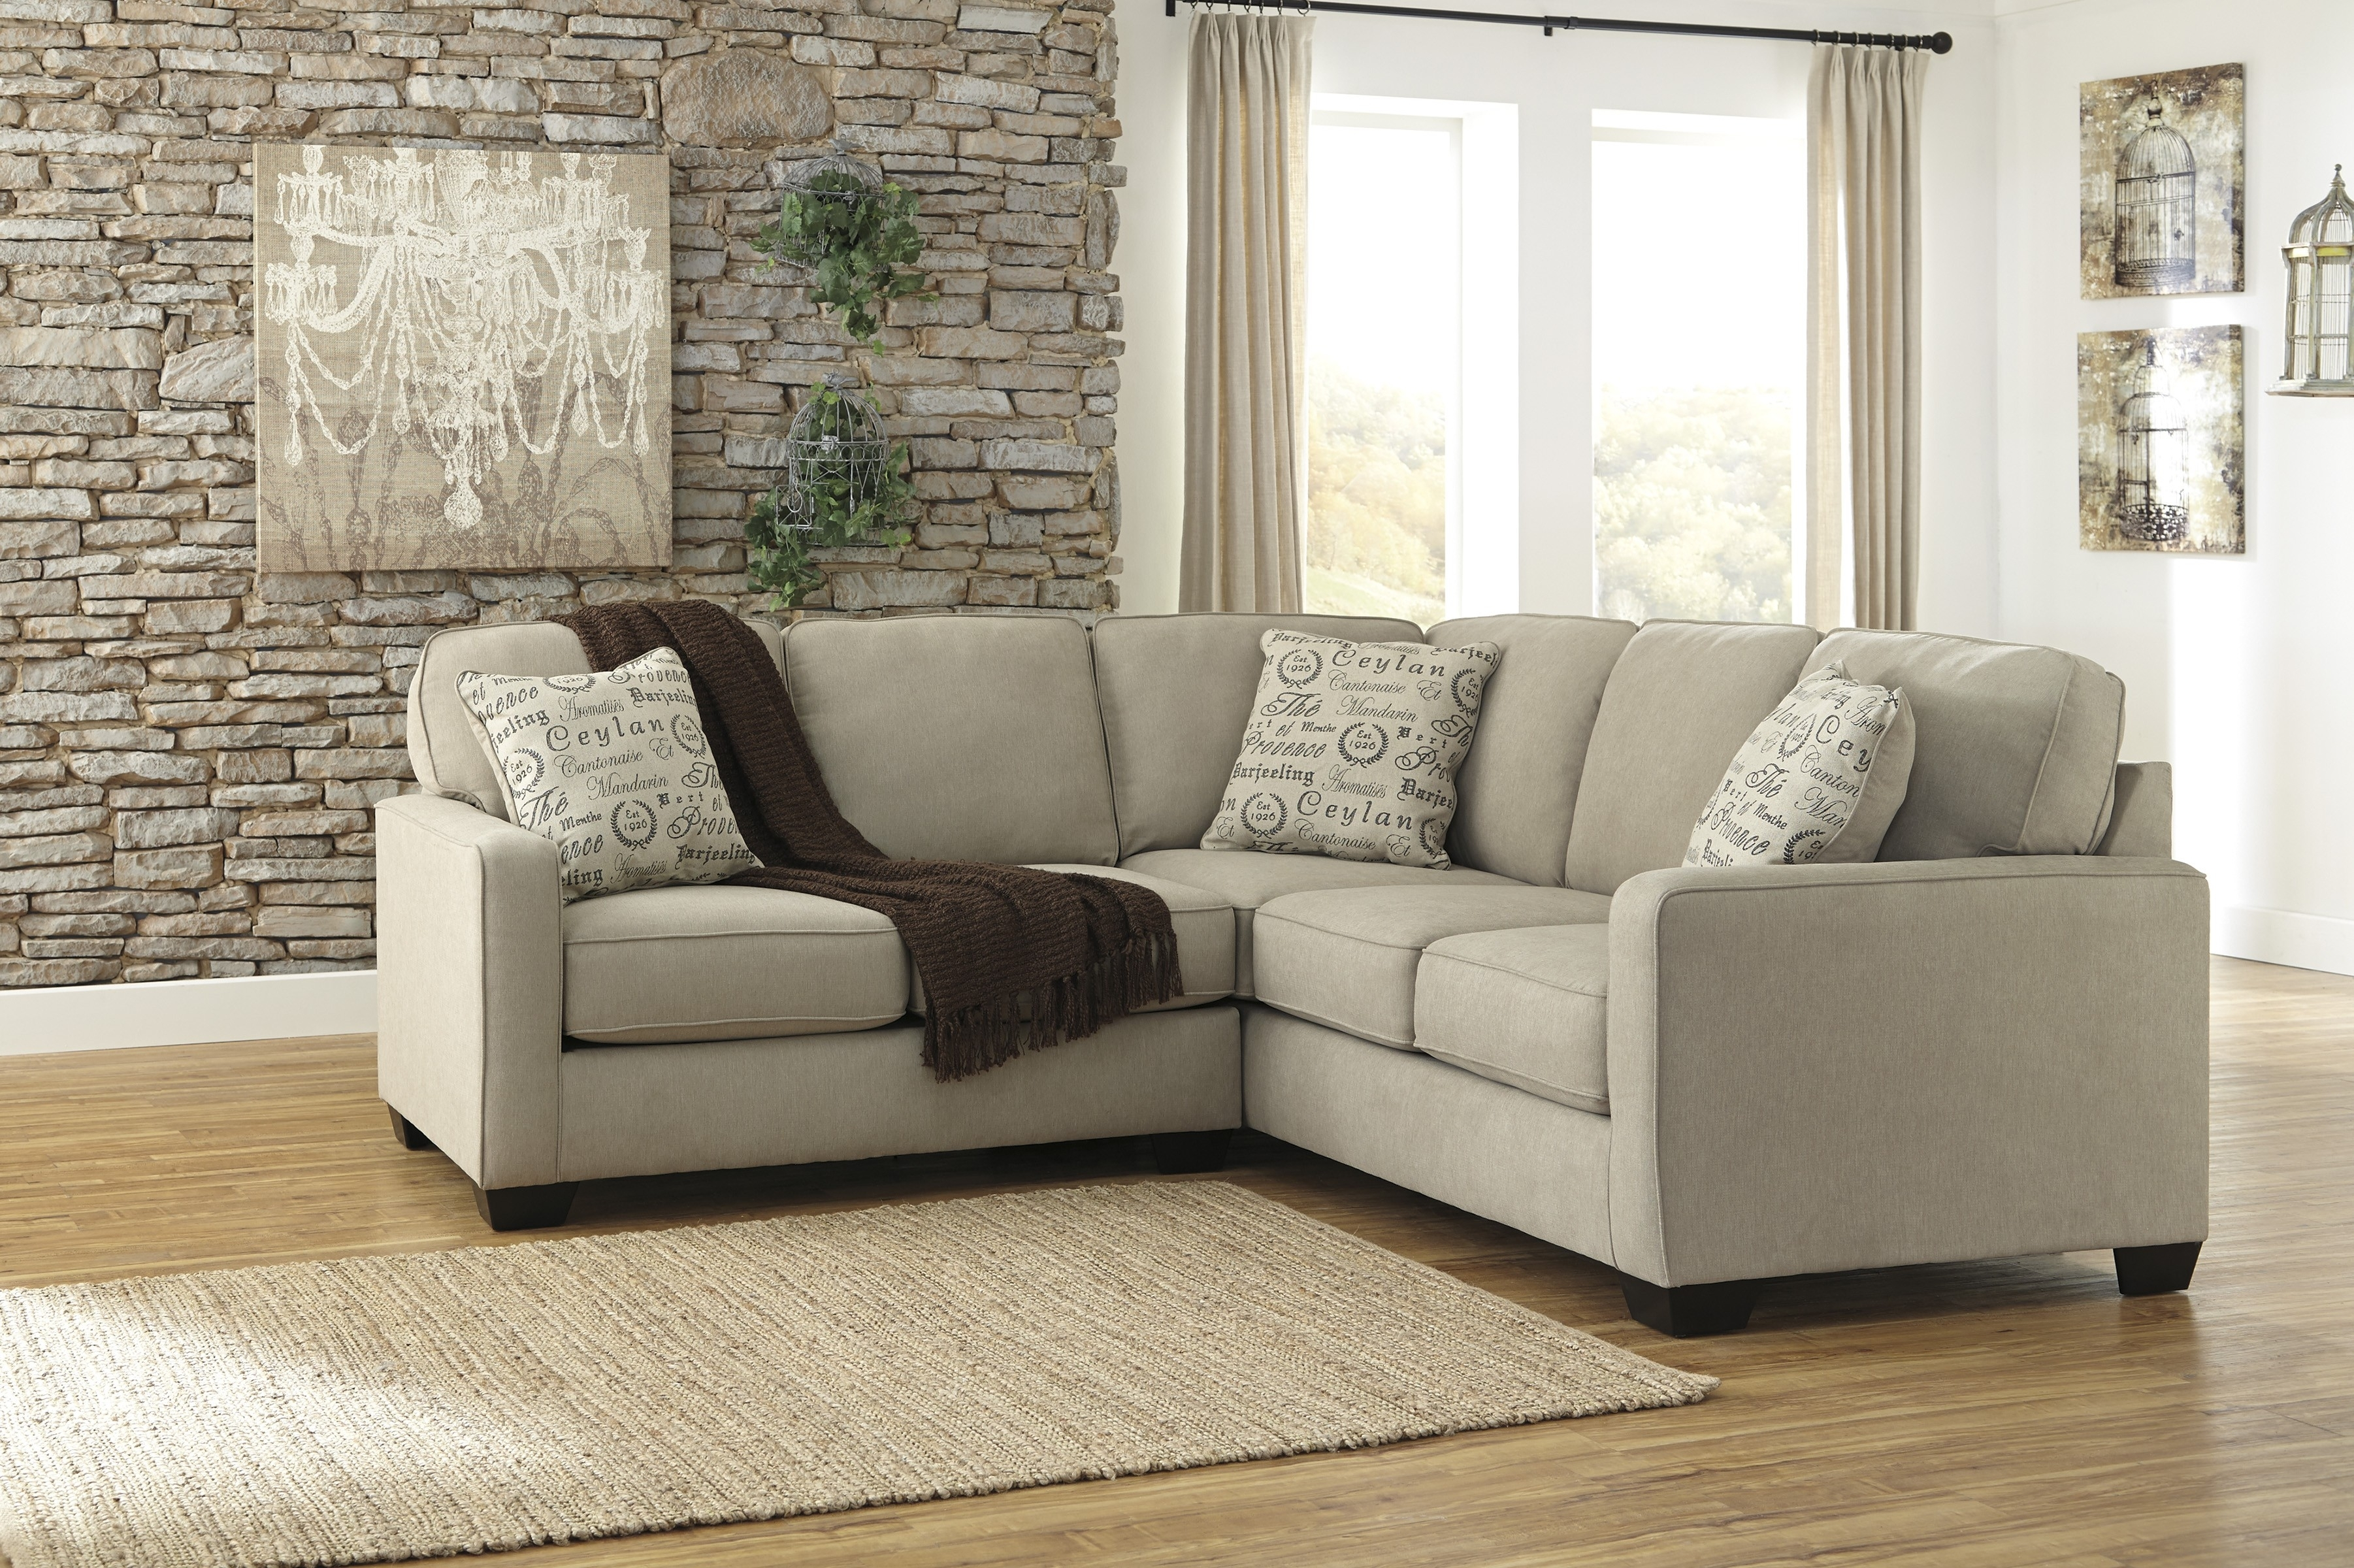 Groe Ecksofas Top Sofa Groe Sitztiefe Luxury Sitzer Sofas U Sitzer